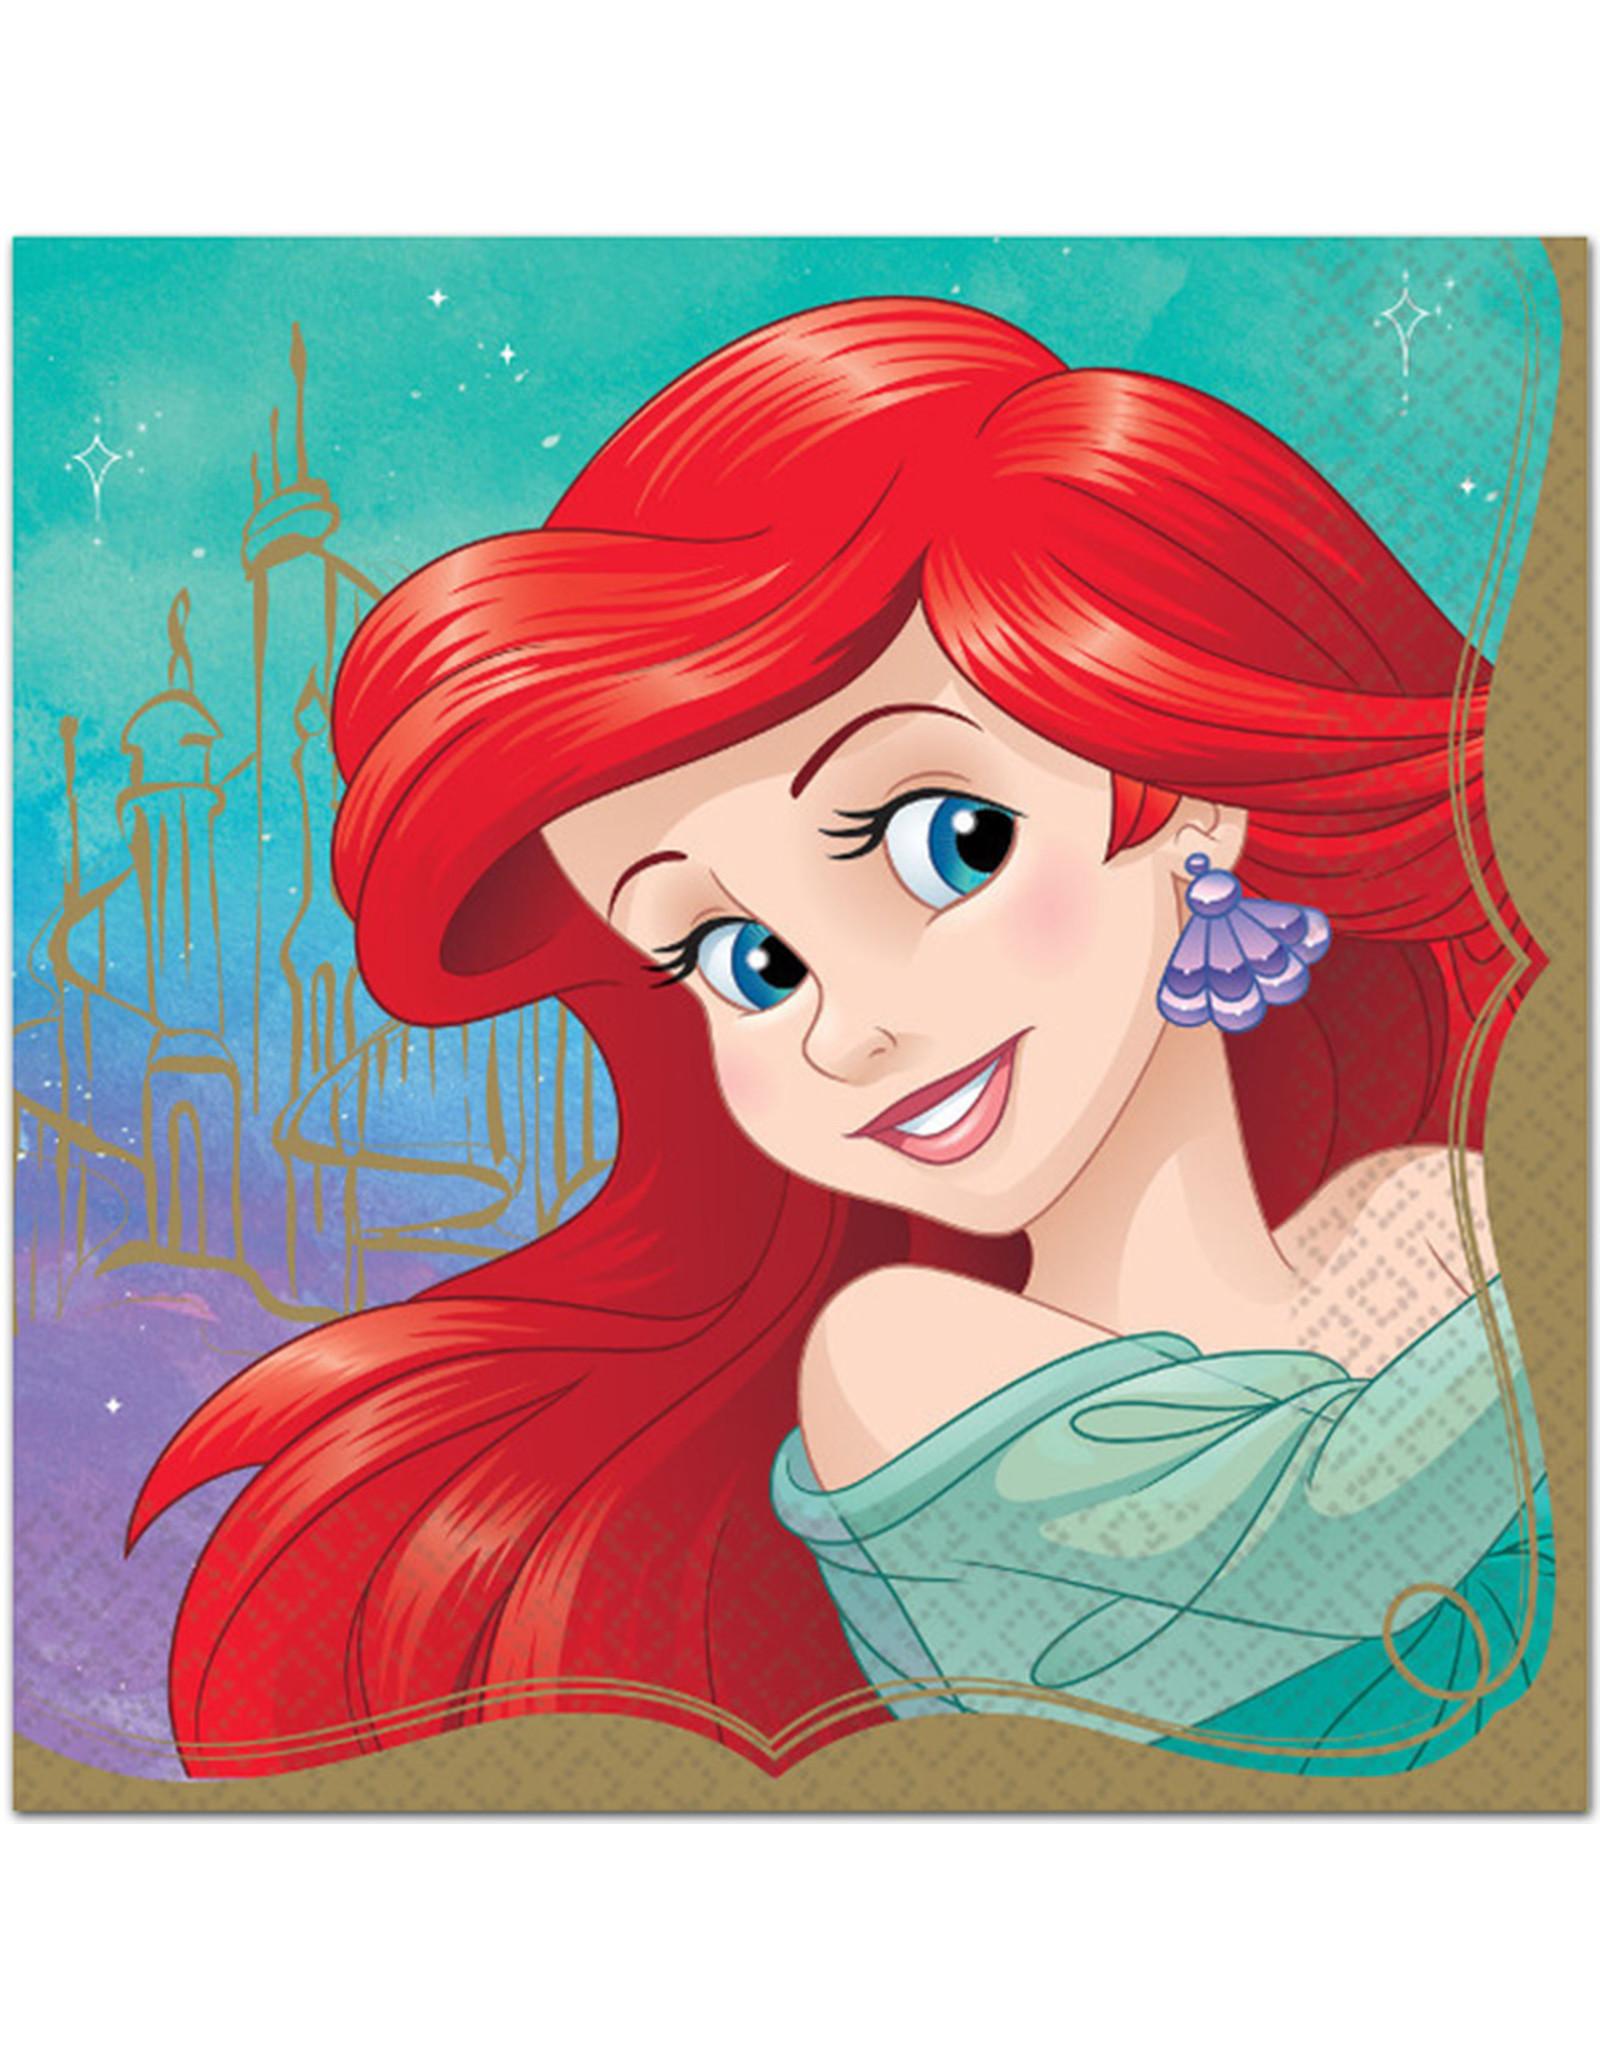 Disney Princess Ariel Lunch Napkins - 16ct